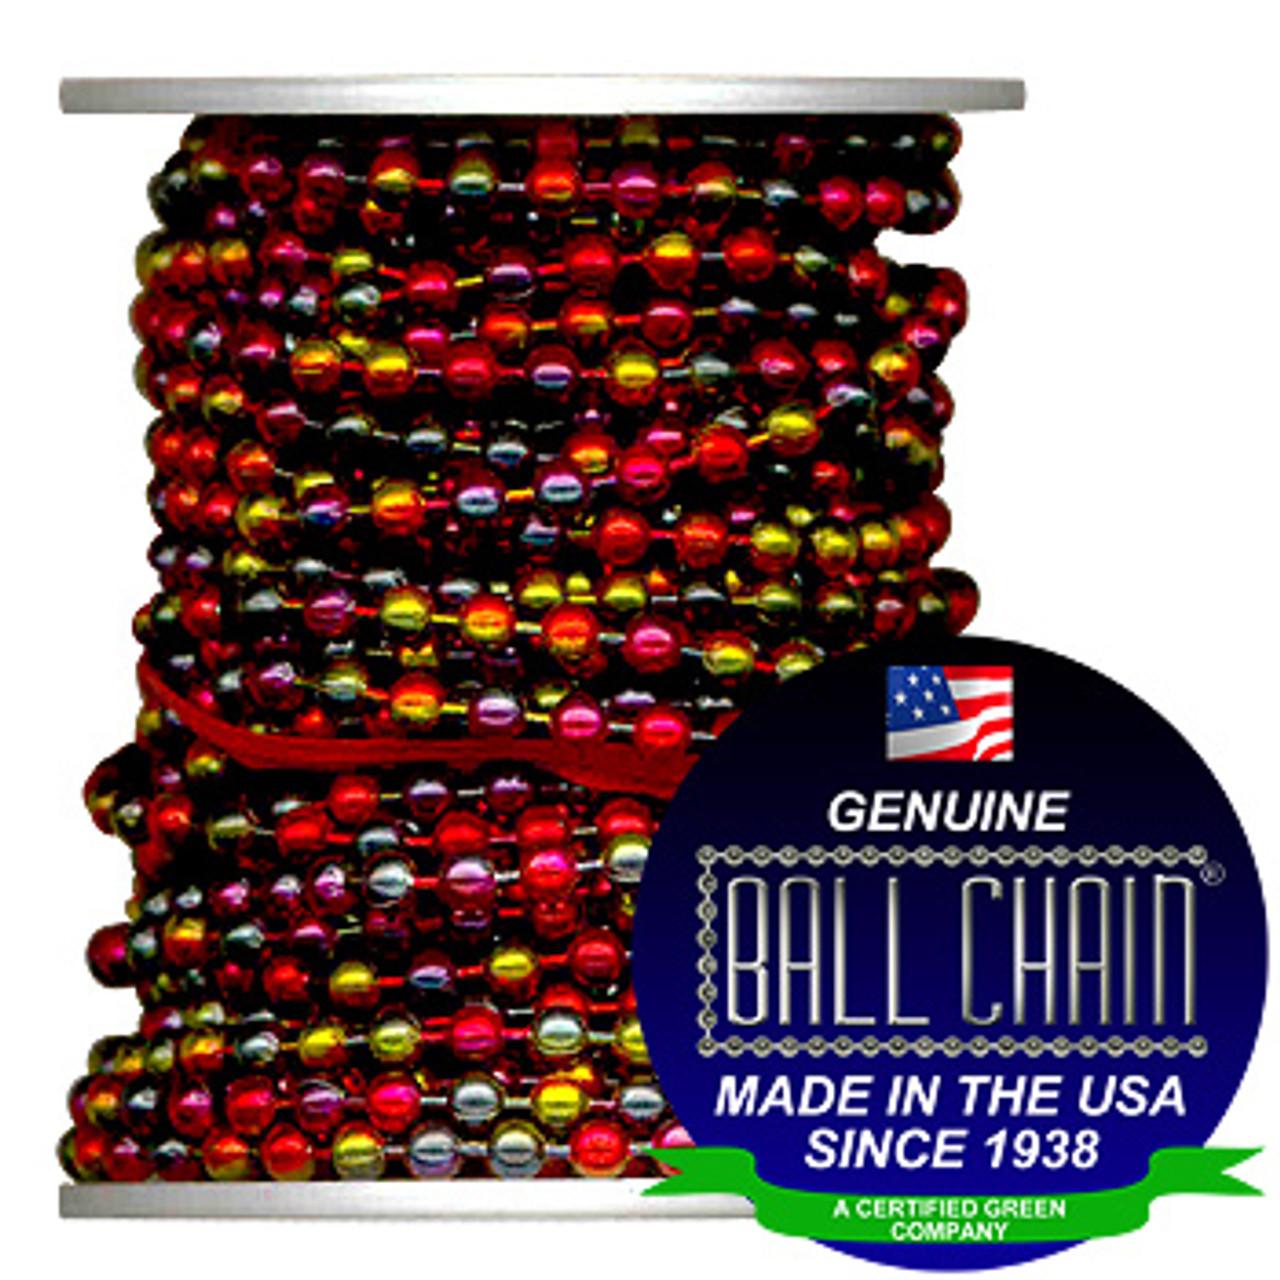 #6 Rainbow Coated Ball Chain Spool